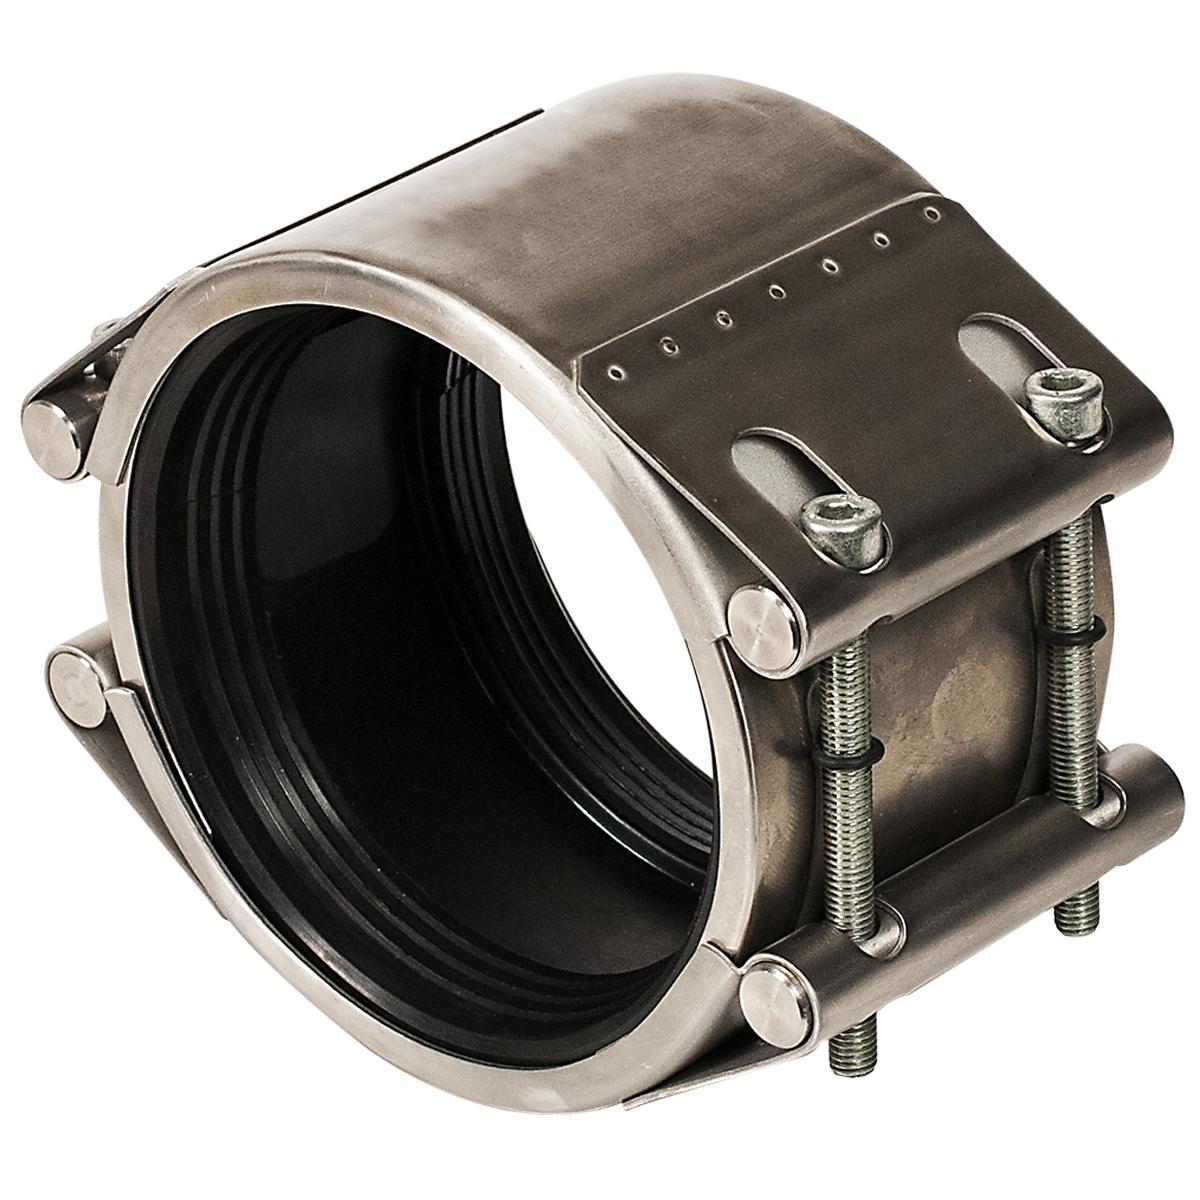 ARMOR SEAL - All stainless steel flexible repair clamp.